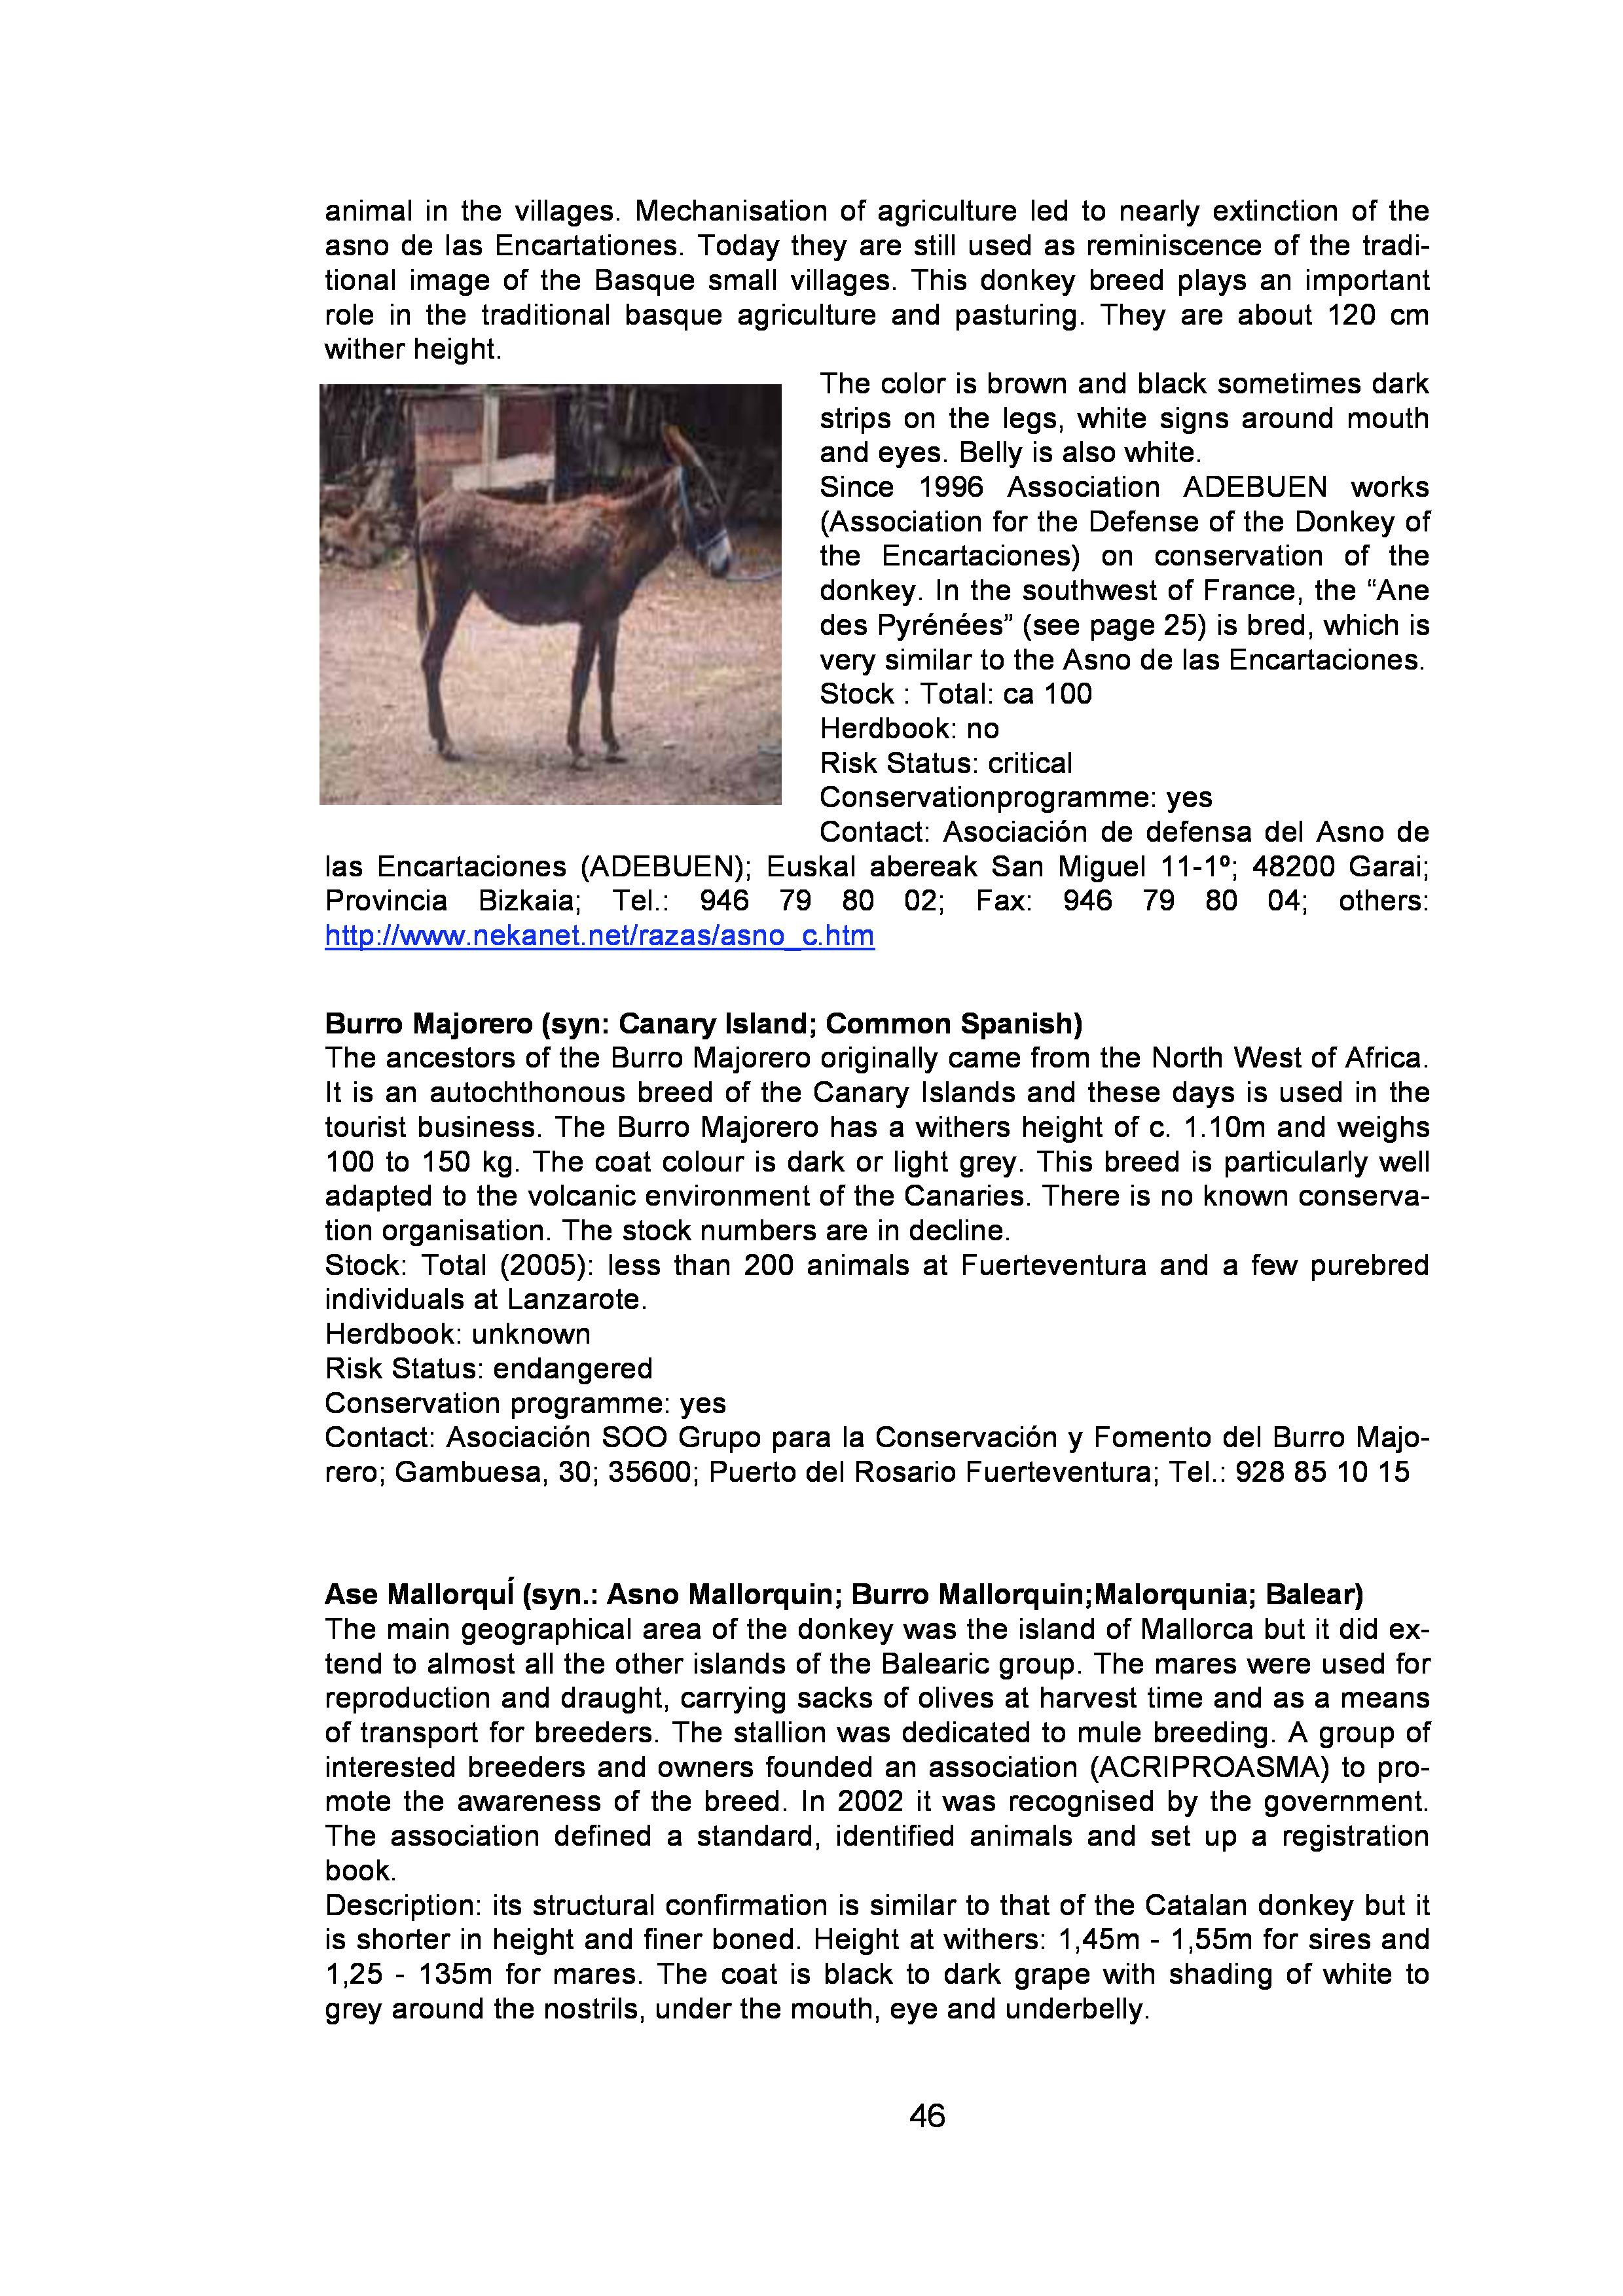 page-45.jpg